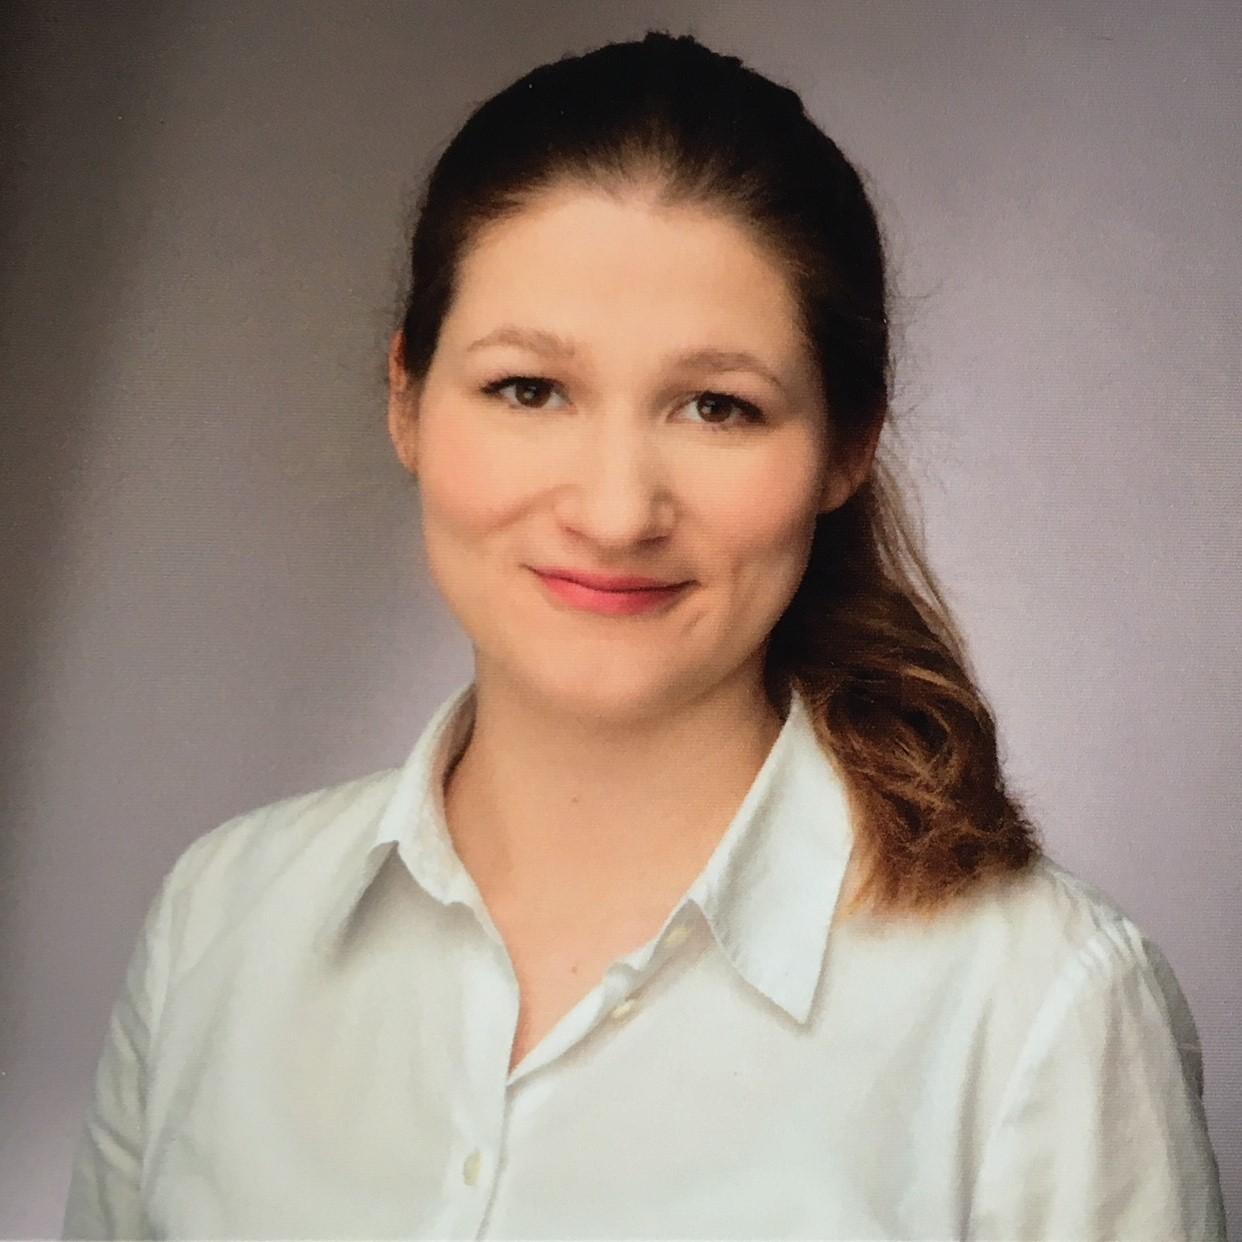 Ela Louise Kruse